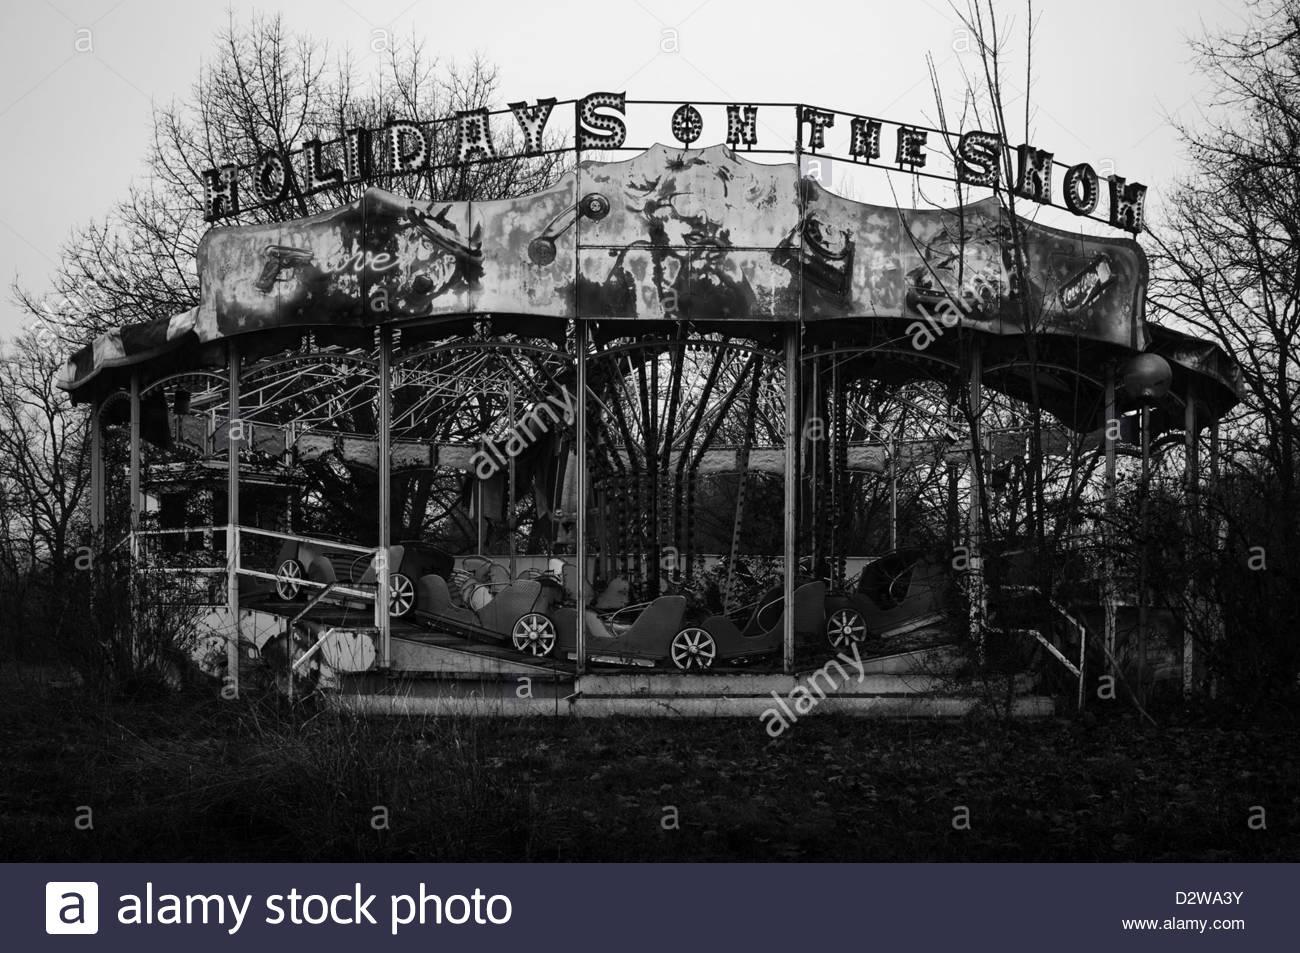 Abandoned fun fair. Carousel - Stock Image